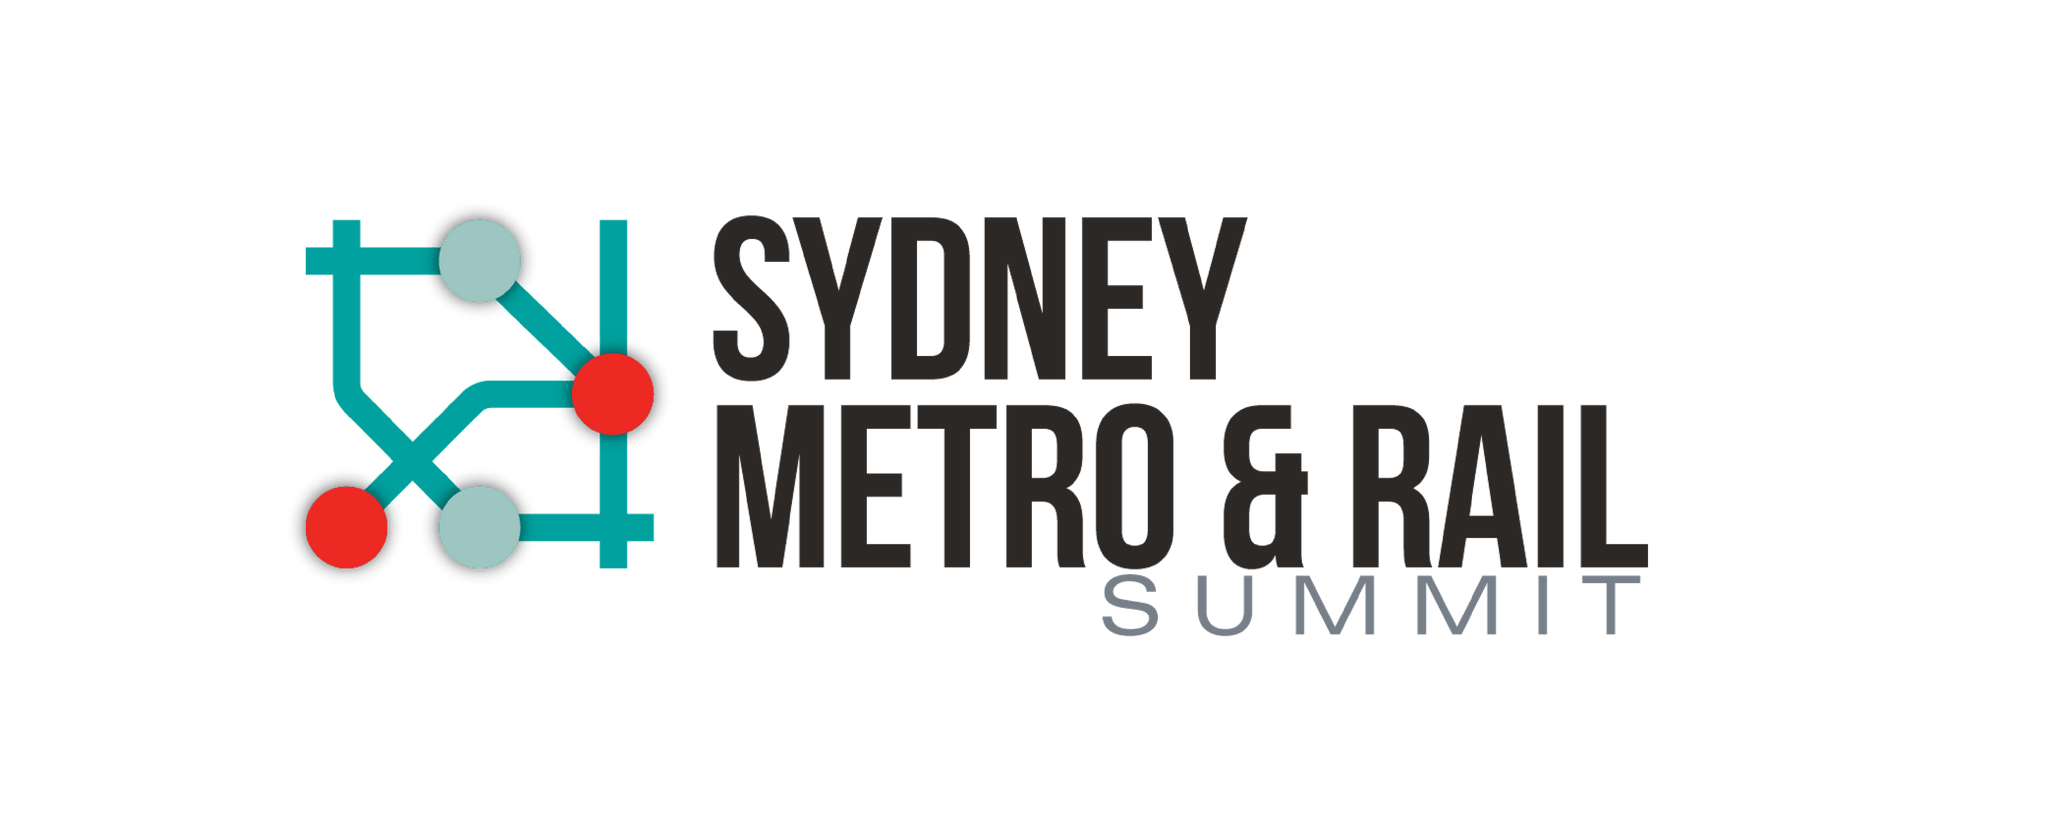 Sydney Metro & Rail Topics & Presentations: